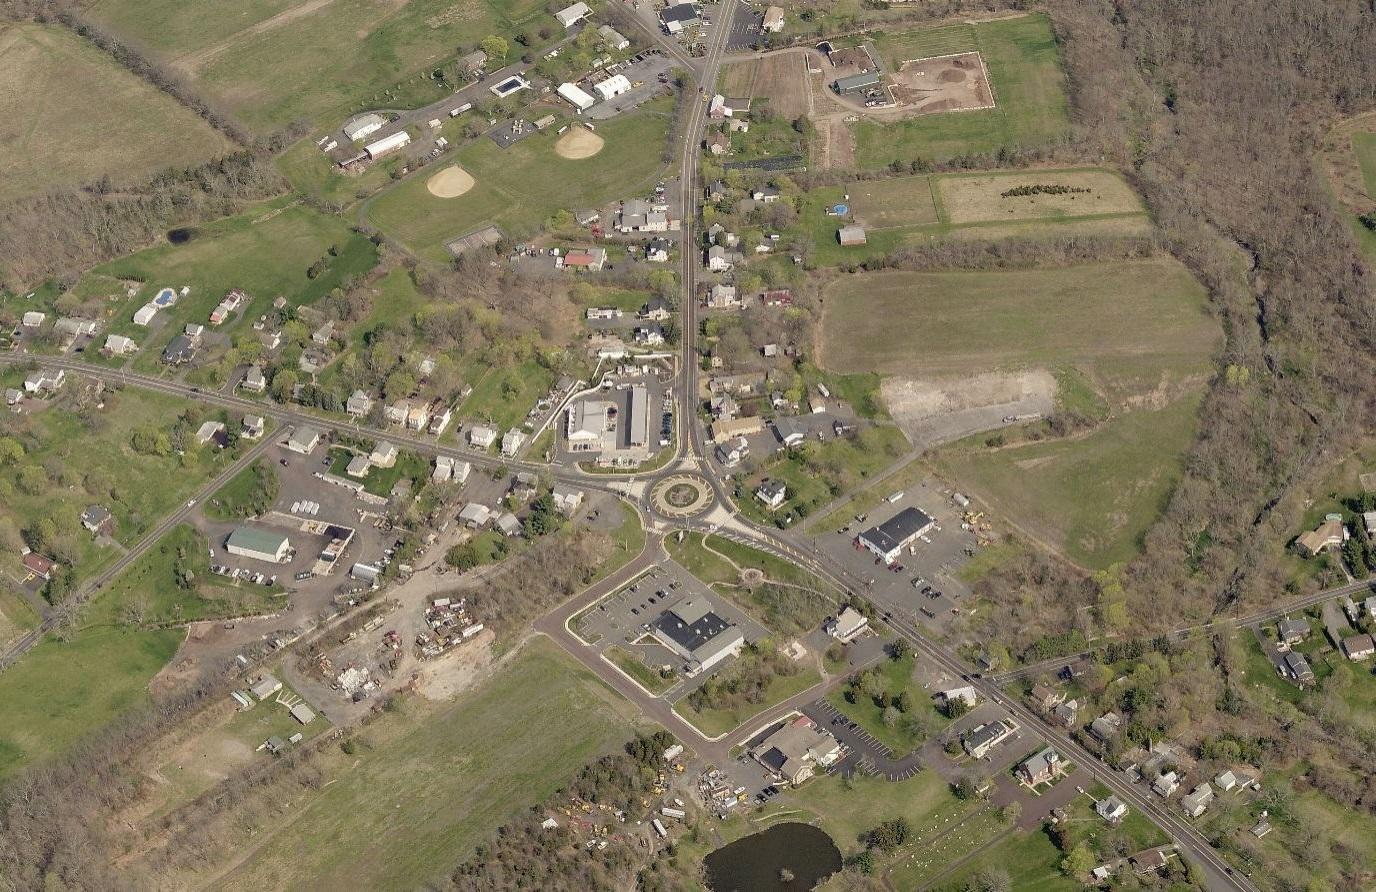 Zieglerville village and surroundings